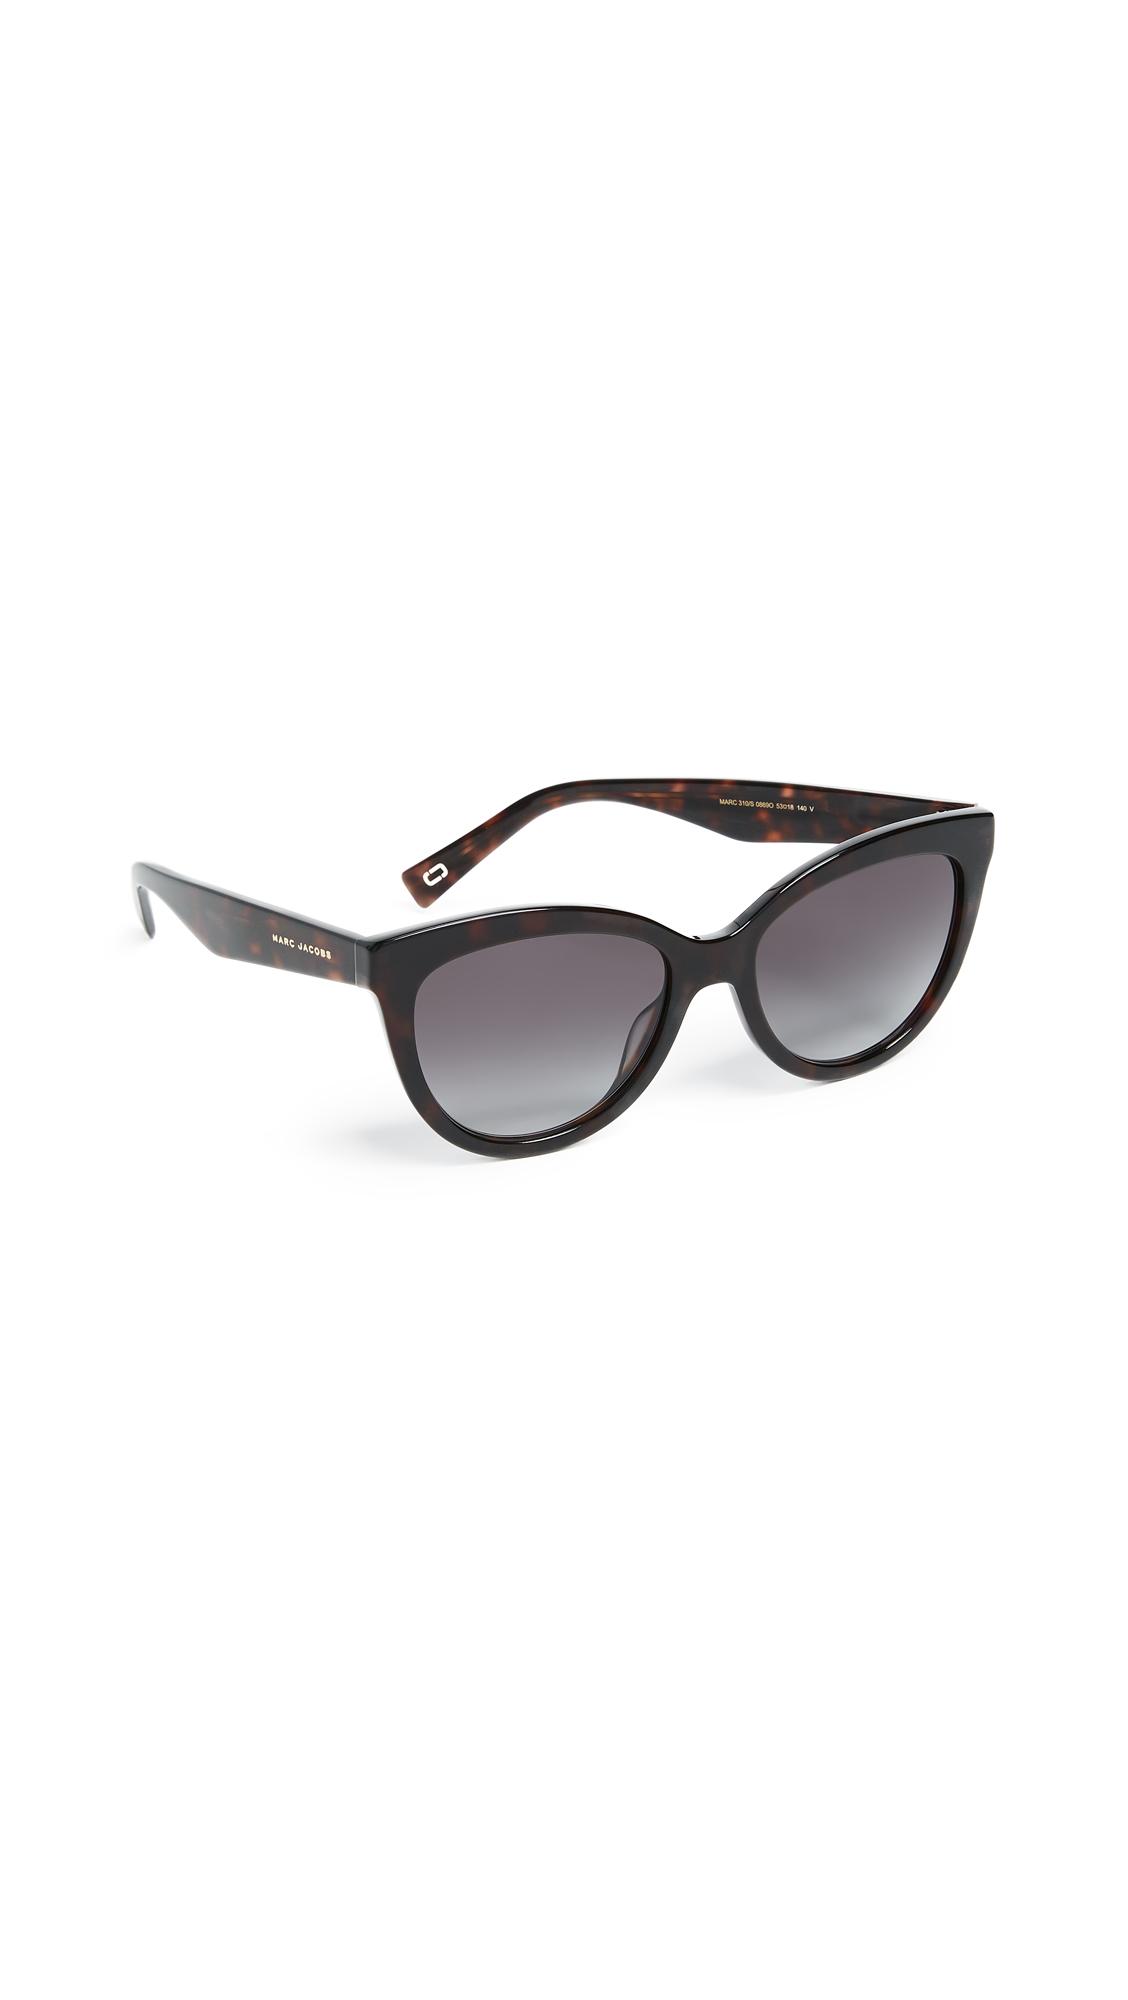 Marc Jacobs Round Slight Cat Eye Sunglasses - Dark Havana/Dark Grey Gradient